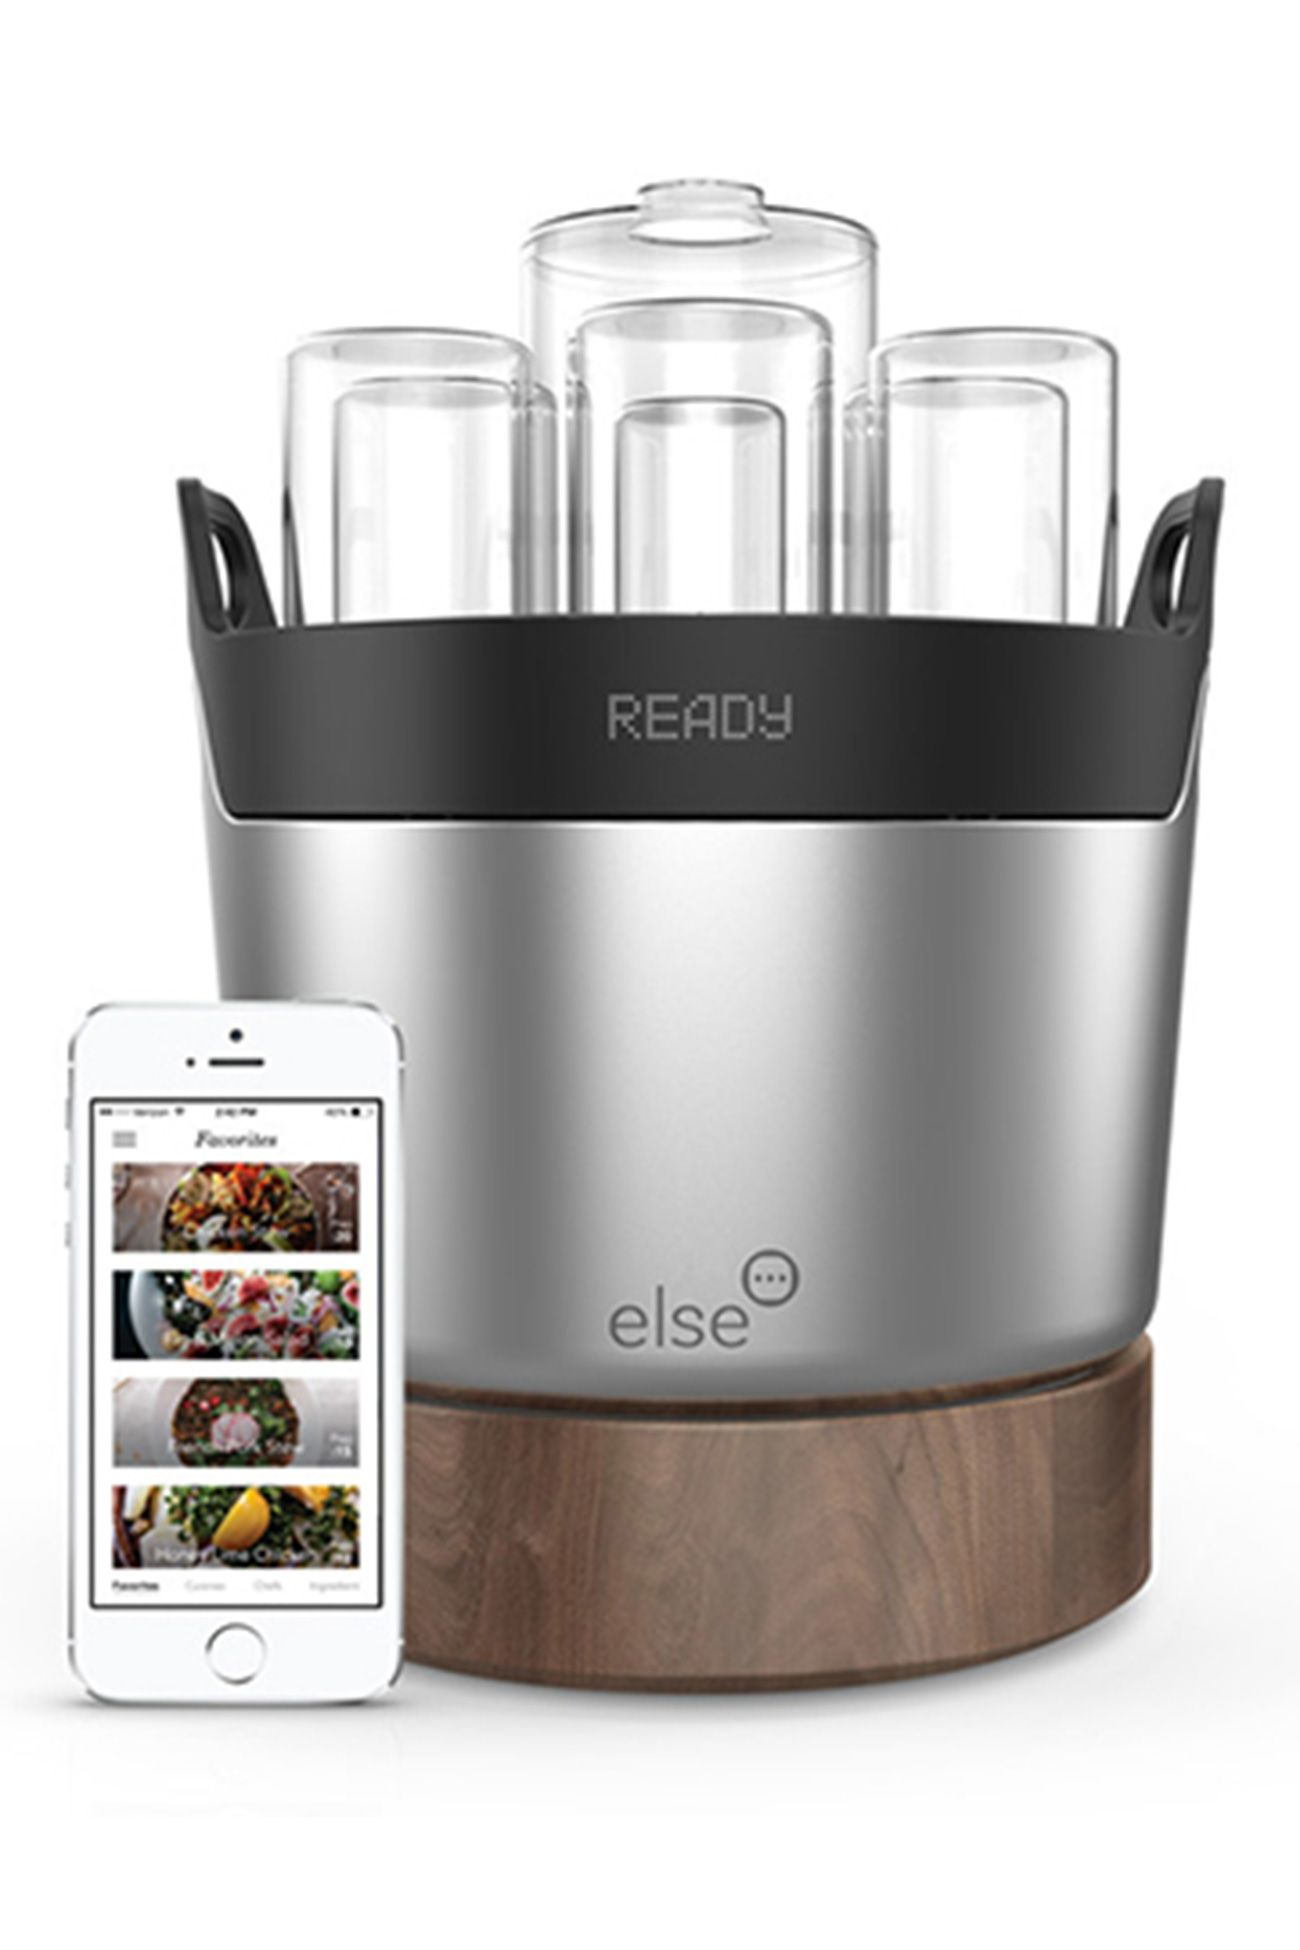 Smart Kitchen Appliances That Look Like The Future Smart Kitchen